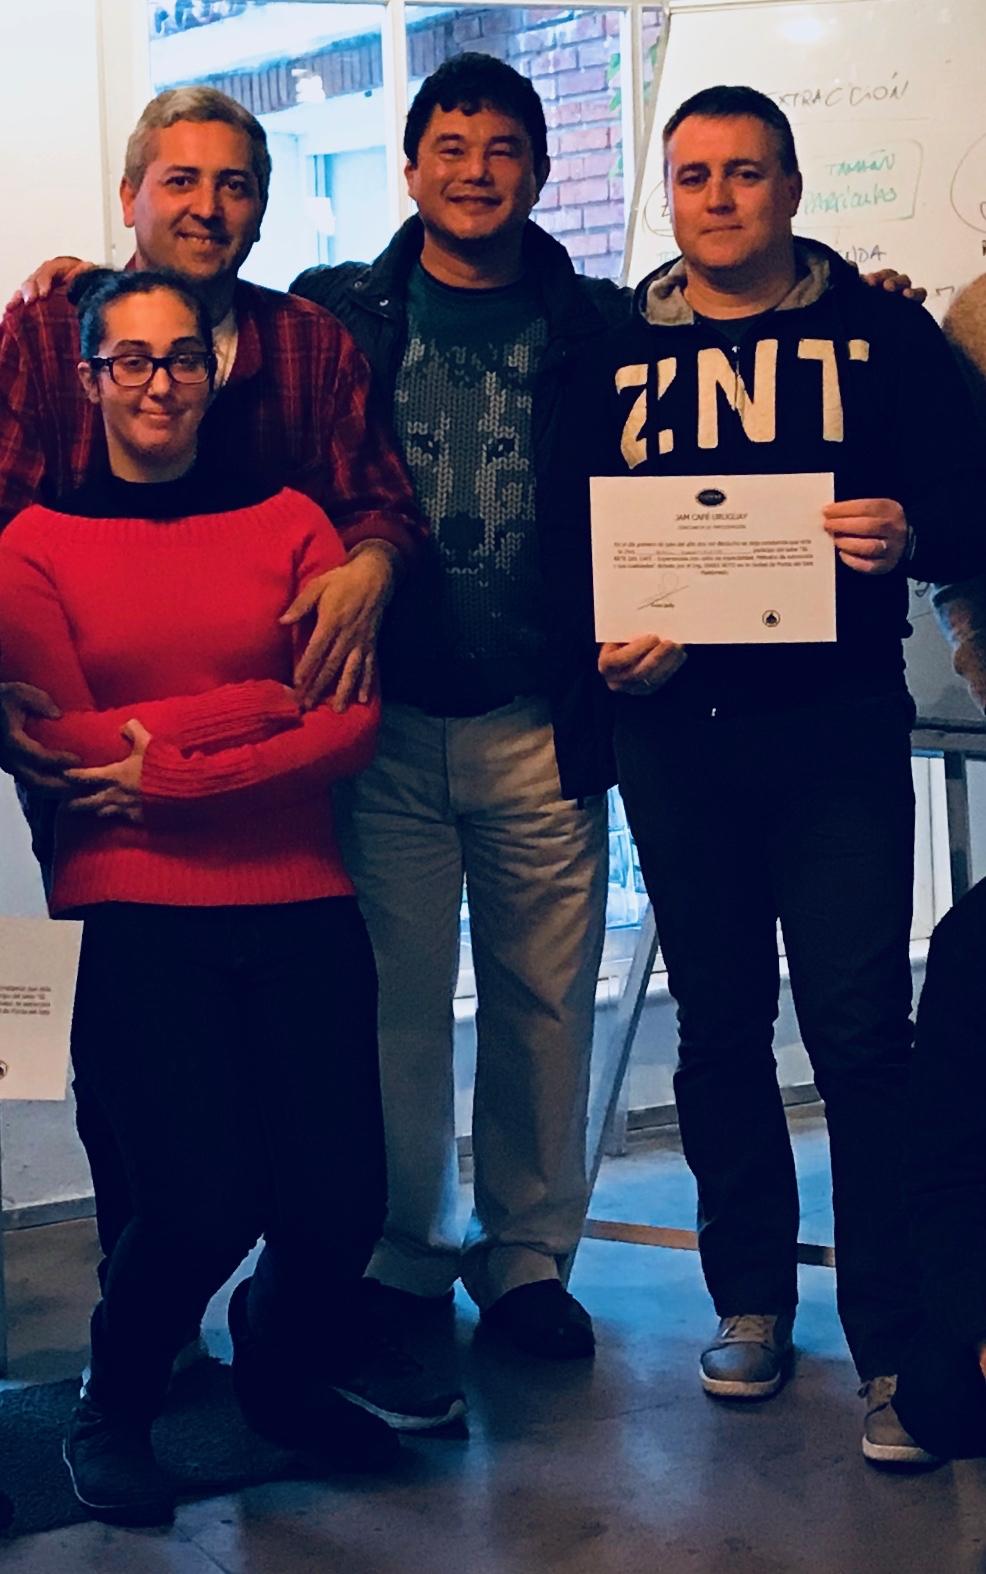 Juan Pablo, barista Candela, Ensei Neto e barista Raul Martirene